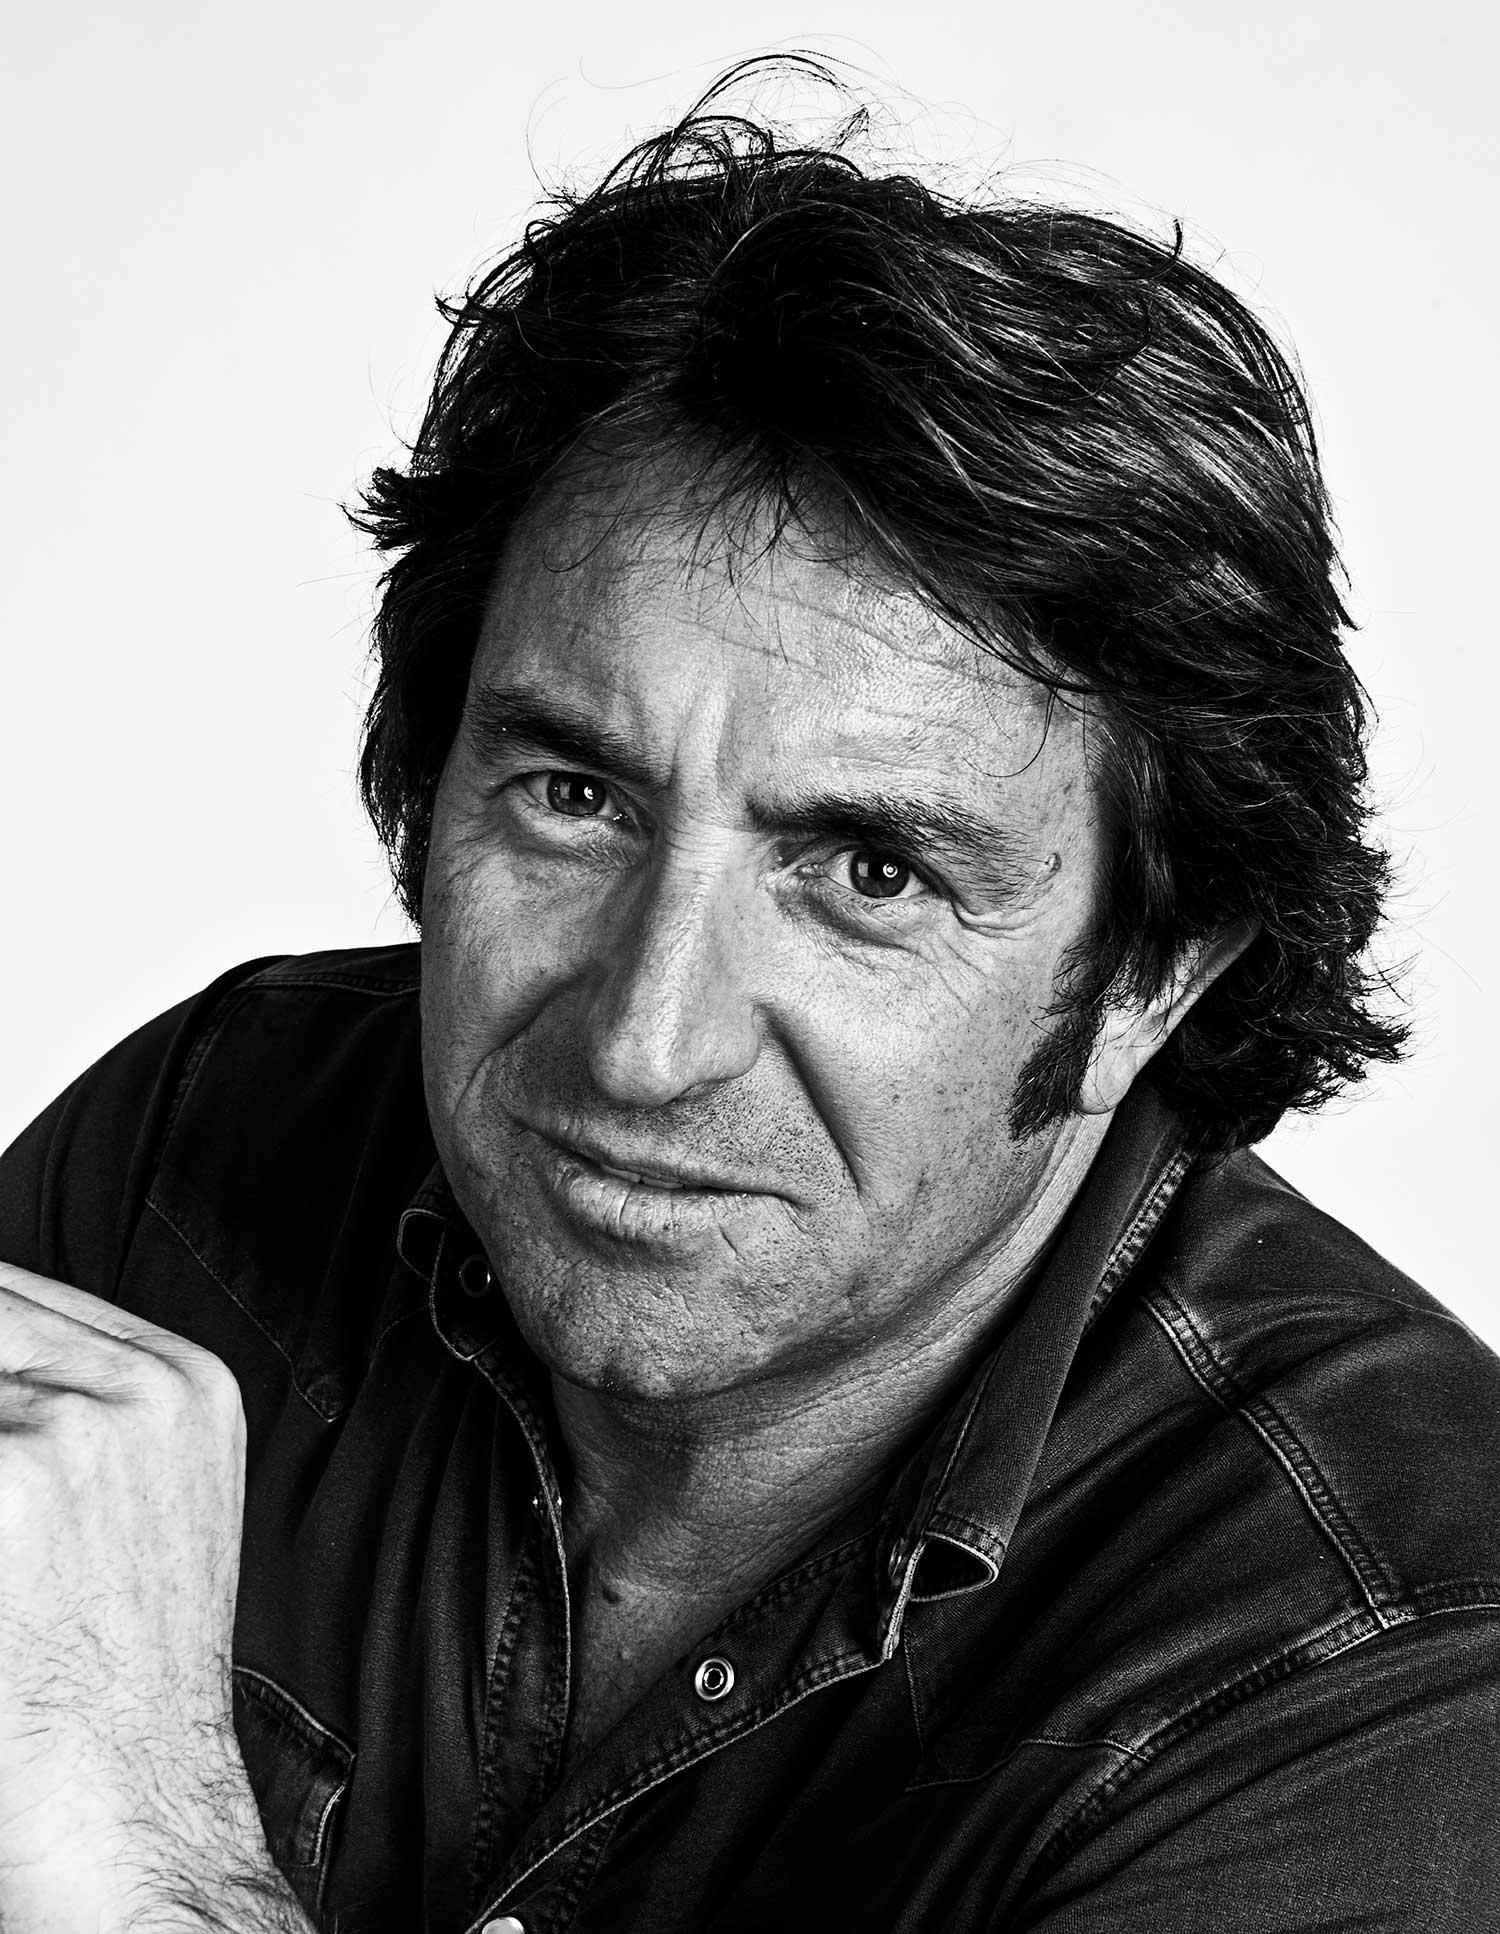 Claudio Orciani